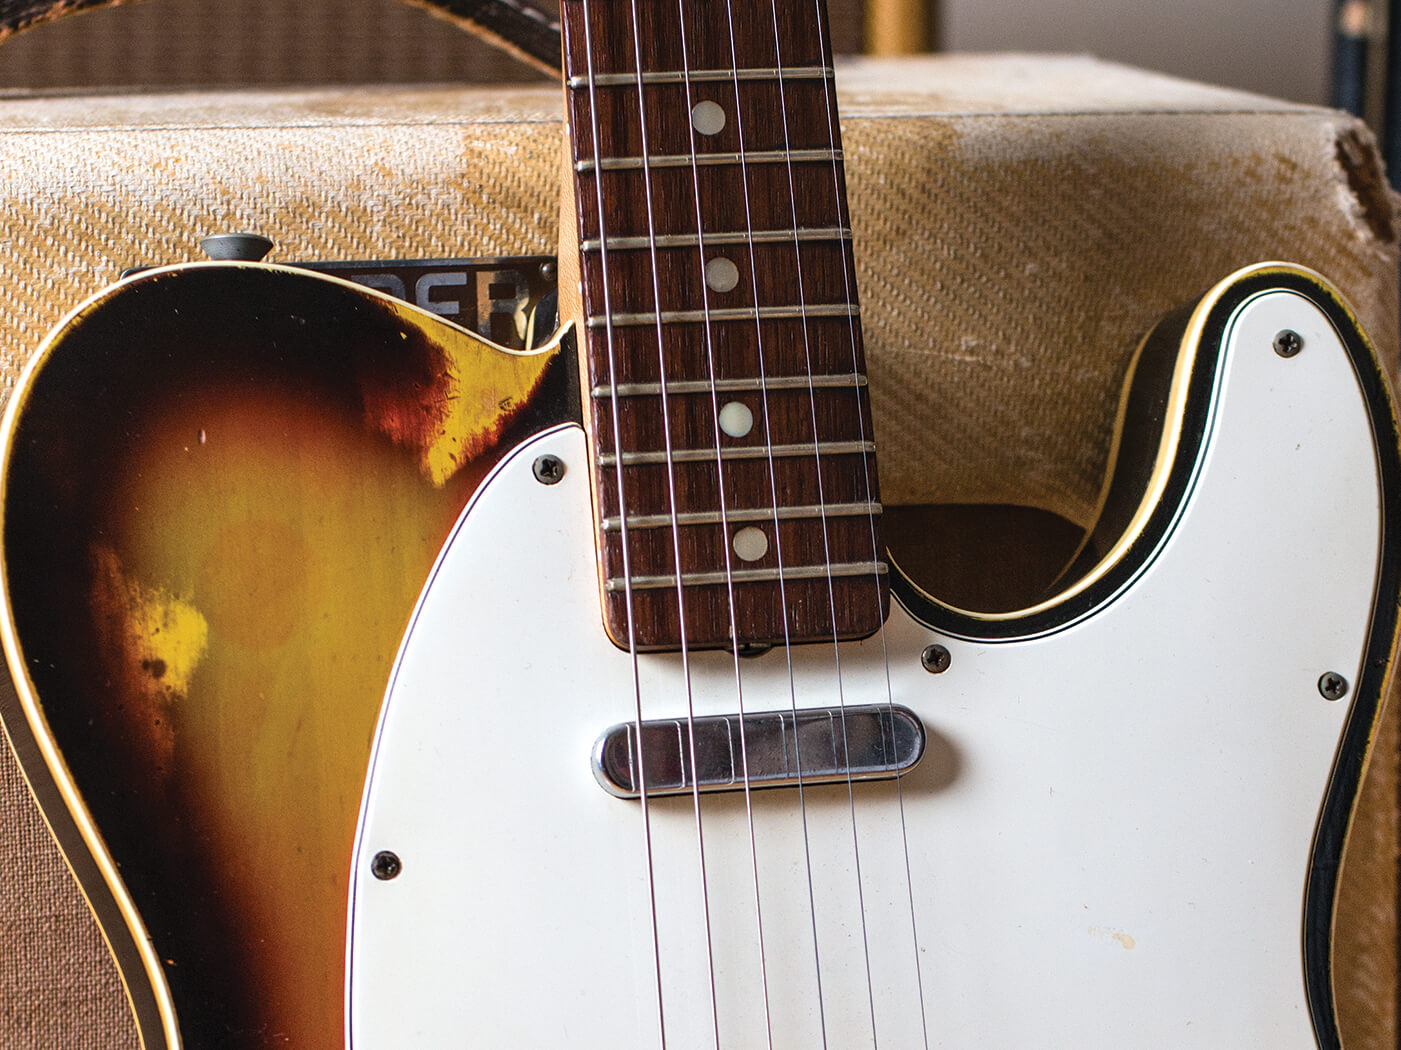 25 Fender Telecaster tips, mods and upgrades - Guitar.com ... on